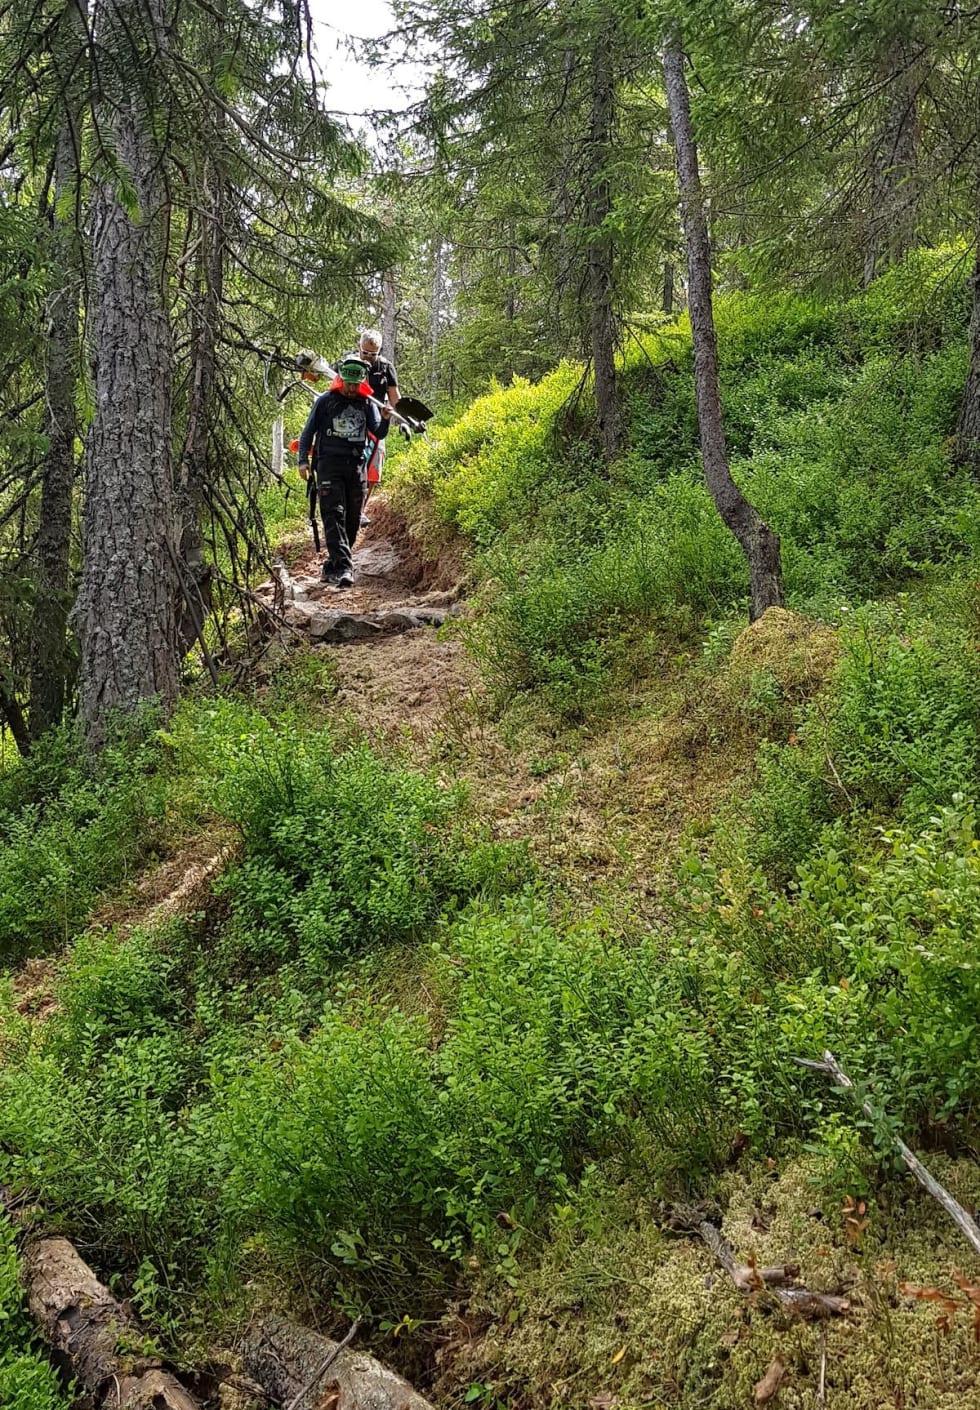 Hakadal Enduro 2018 - new trail - Stian T Eilifsen 1200x